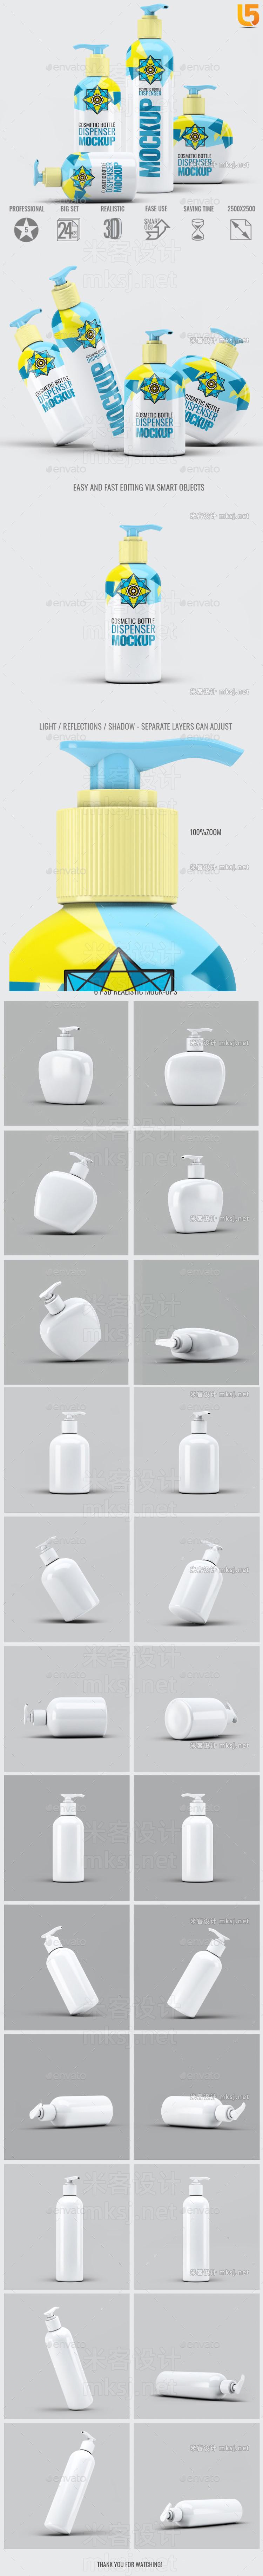 VI贴图 4款化妆品洗浴用品泵瓶包装设计PS模型mockup样机